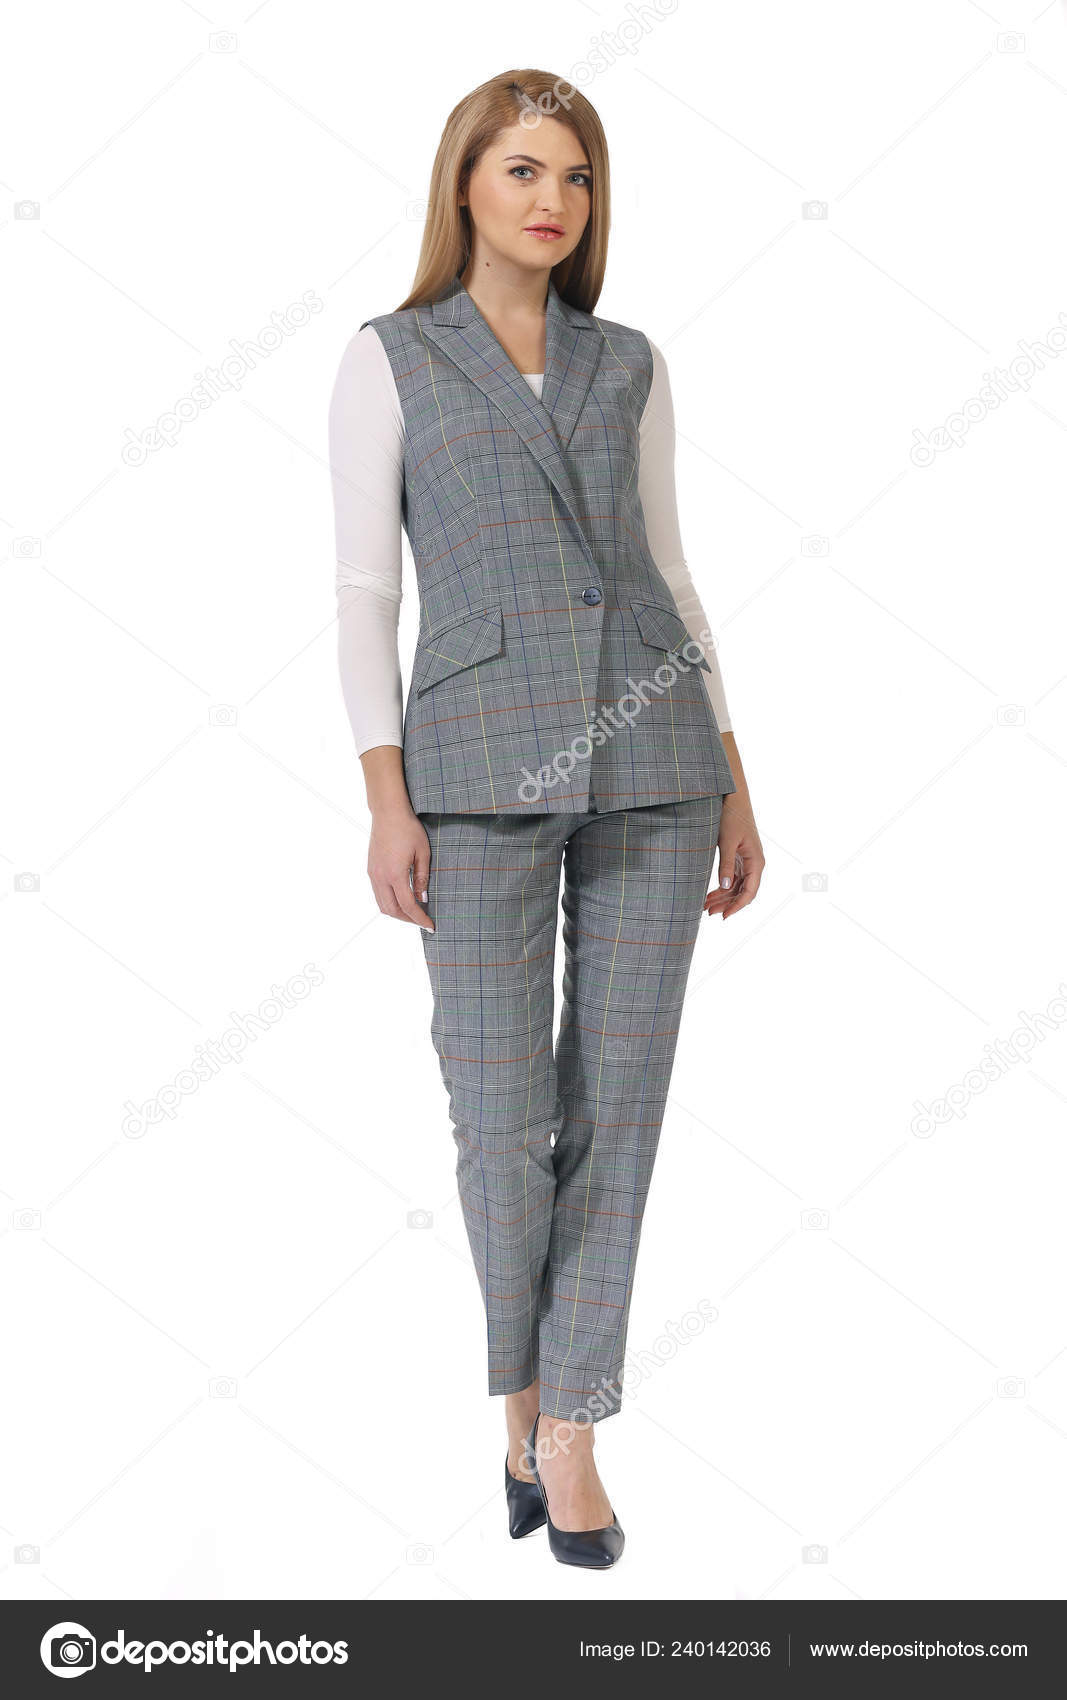 180ab8543 Joven Caucásicos Mujer Ejecutivo Posando Trousrs Gris Chaleco Oficial Traje  — Foto de Stock